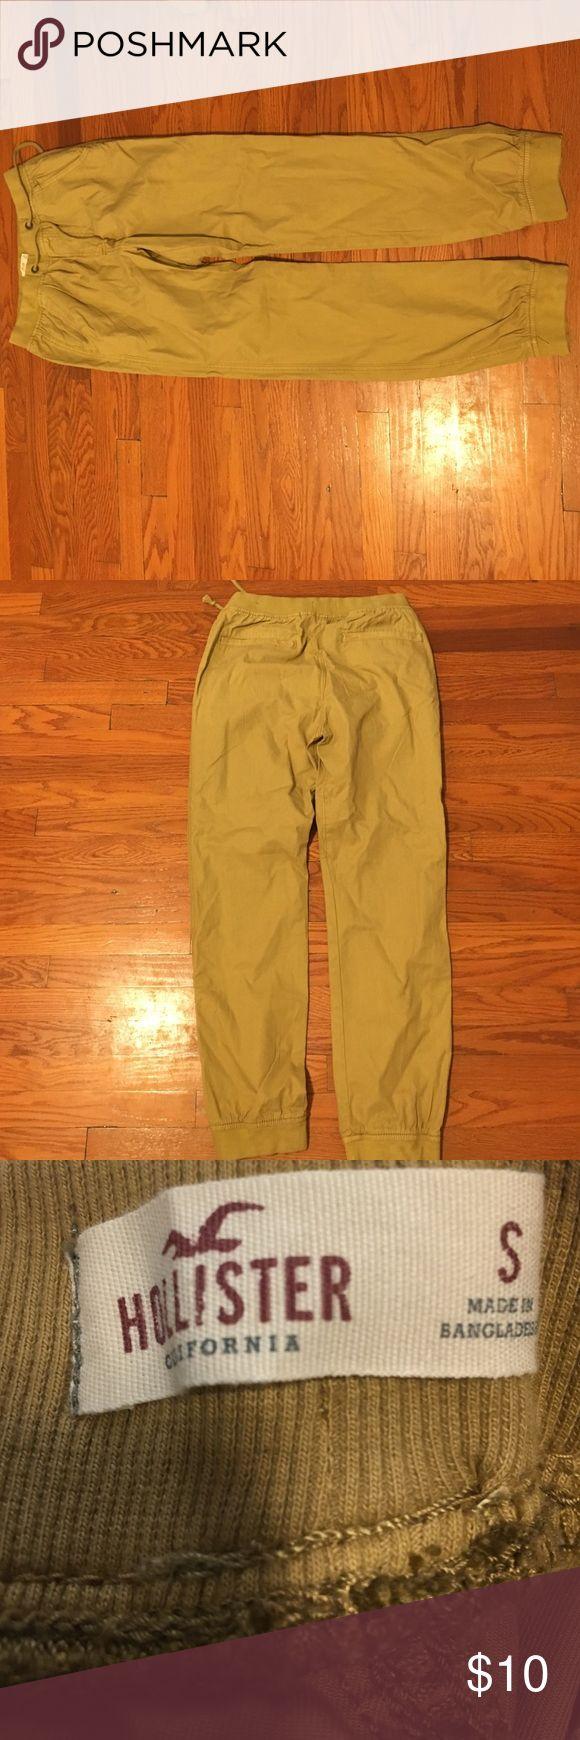 Hollister khaki jogger pants. Elastic raise, cuffed at the bottom, size small Hollister Pants Sweatpants & Joggers